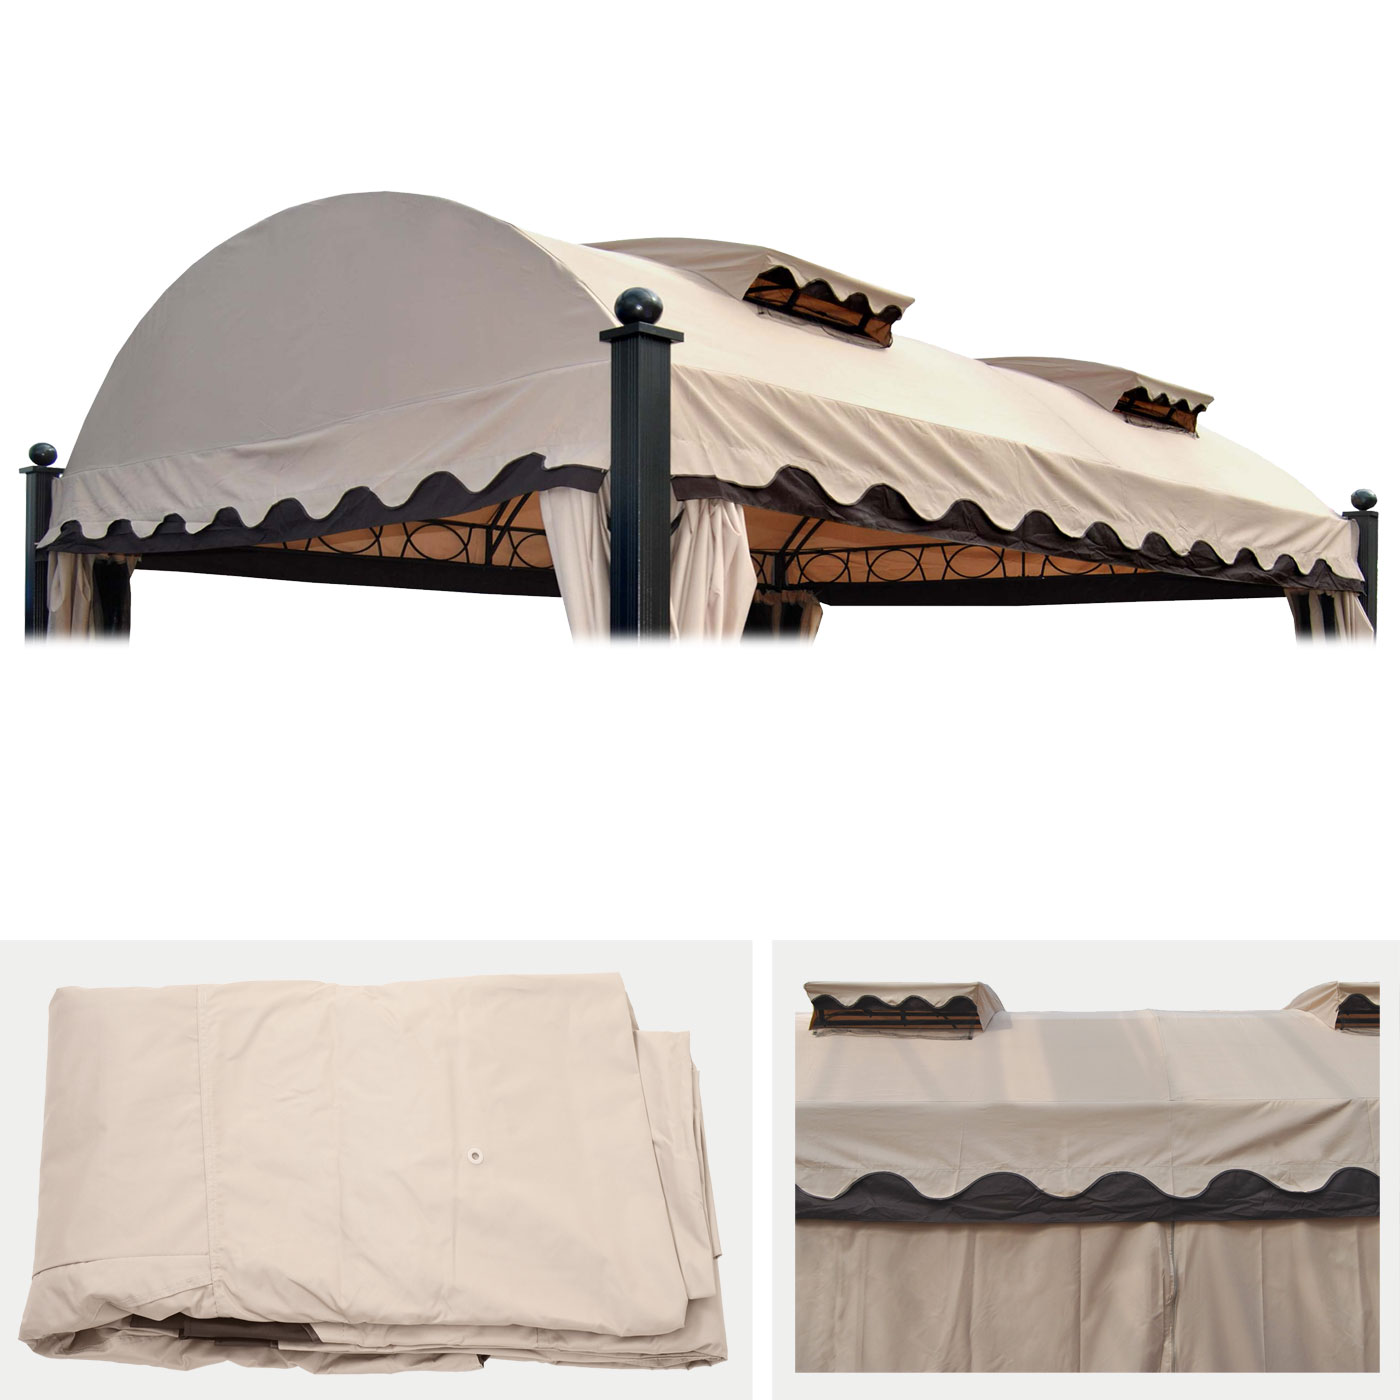 ersatzbezug f r dach pergola pavillon daroca 4 5x3 5m creme. Black Bedroom Furniture Sets. Home Design Ideas